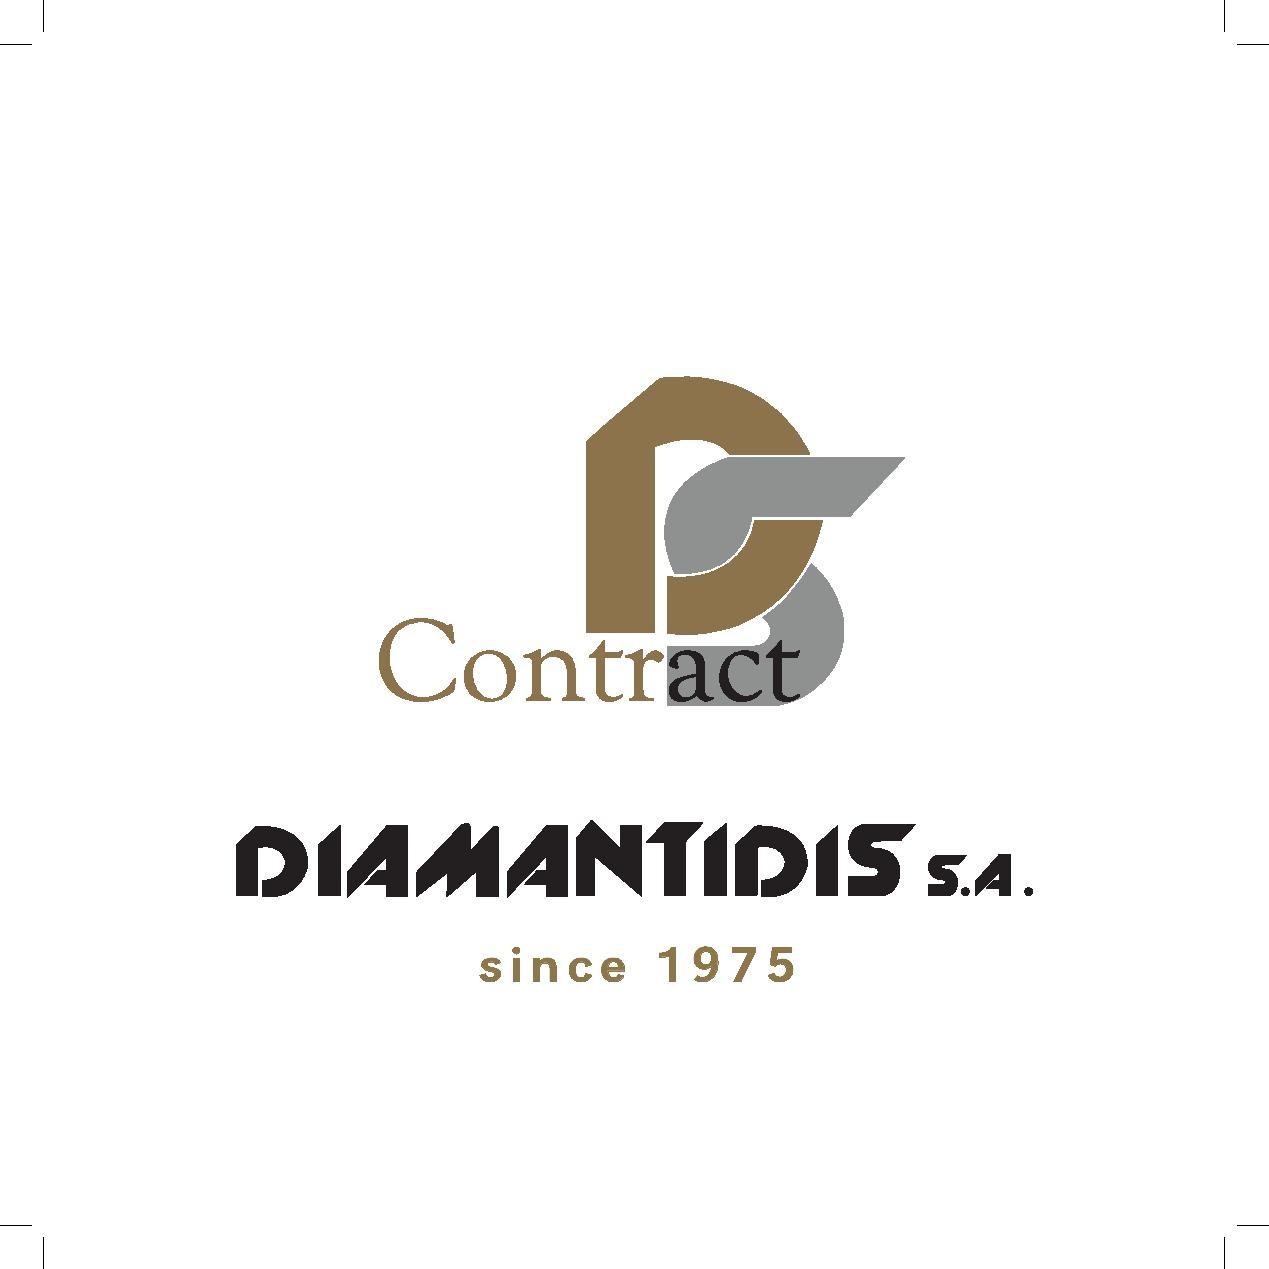 diamantidis-logo